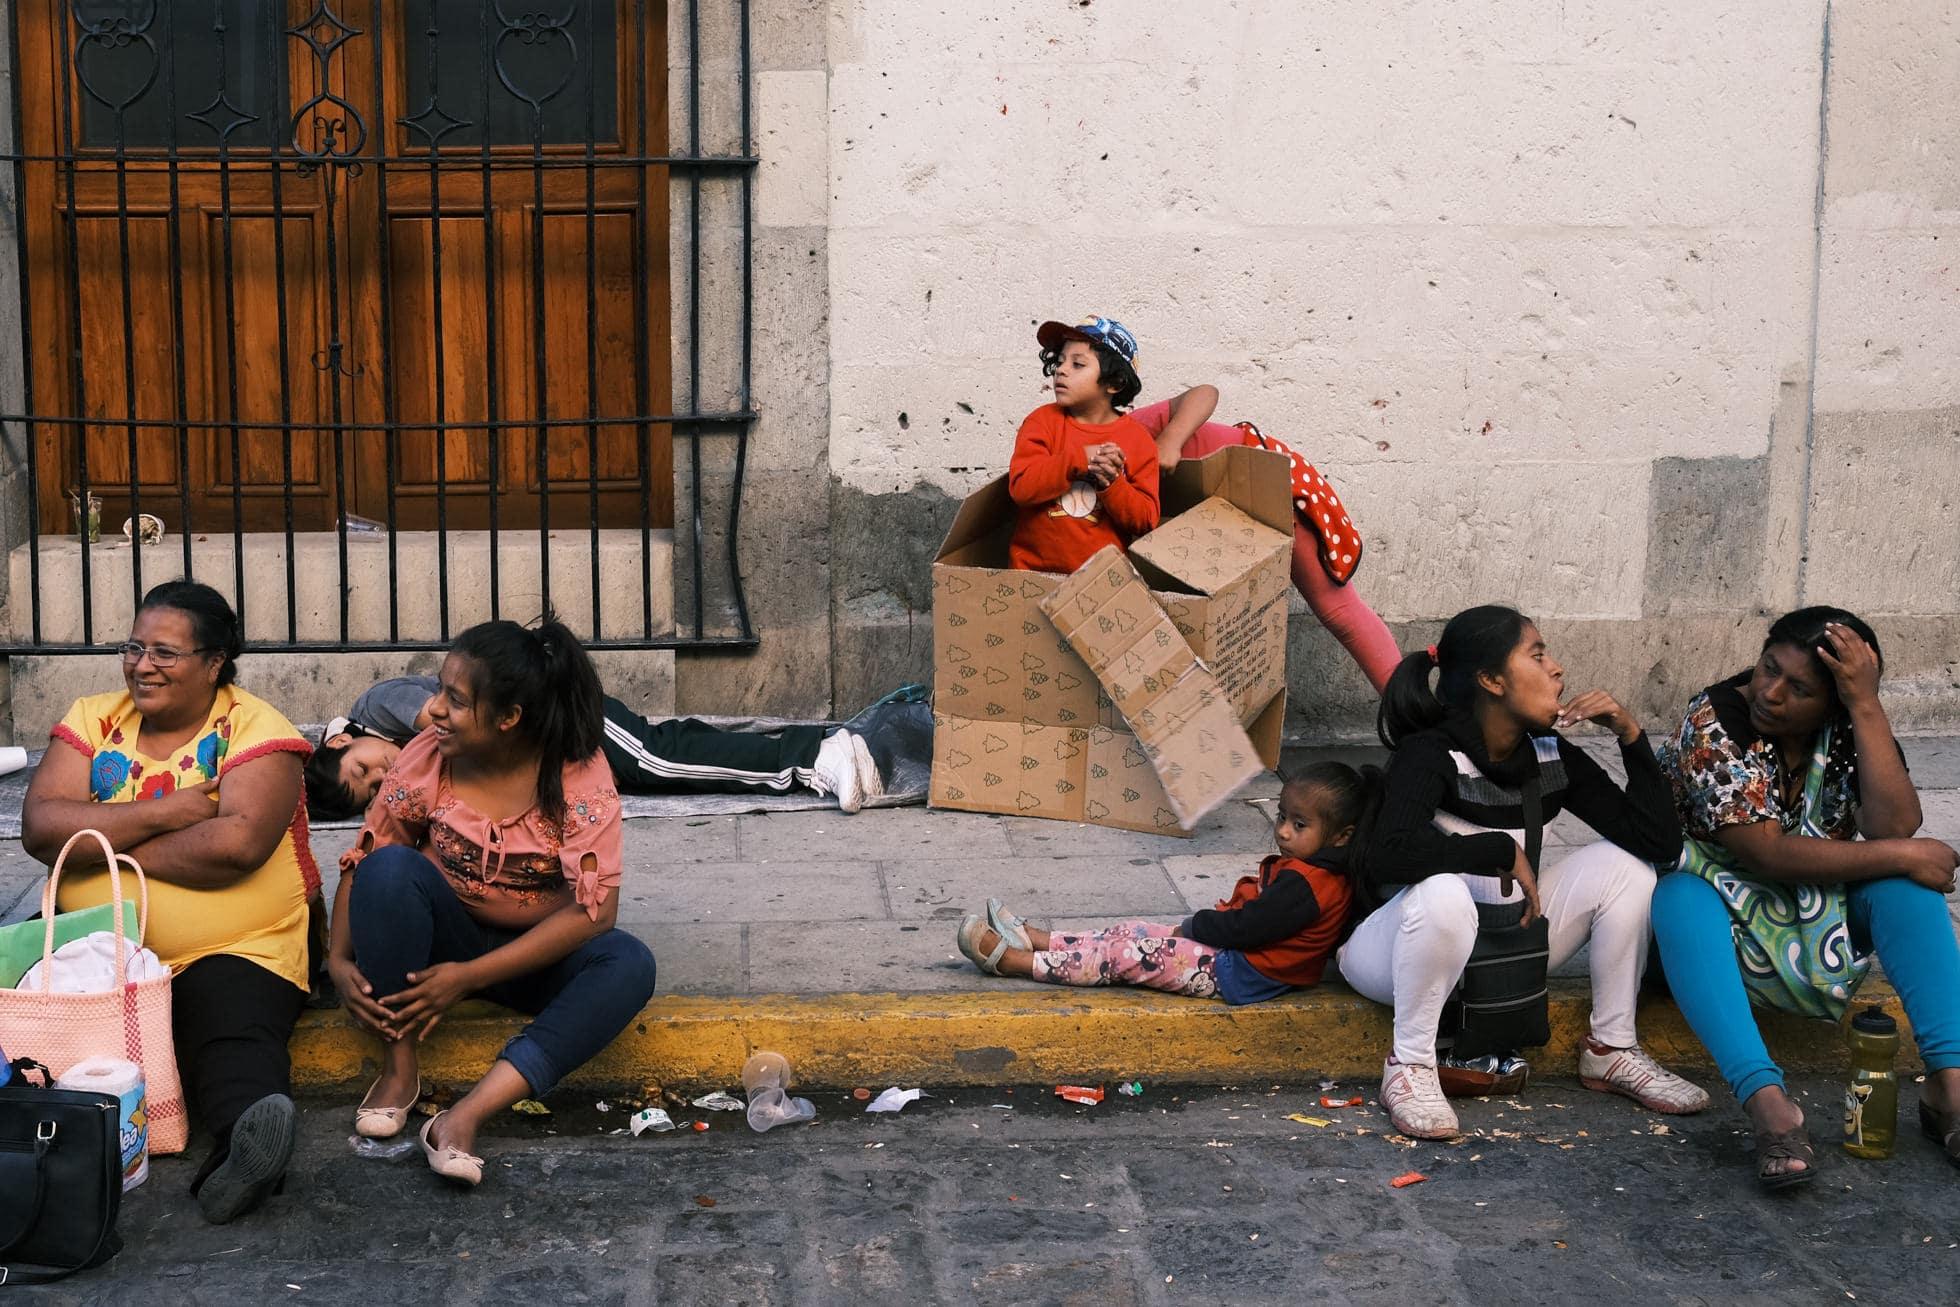 fujifilm-x-pro3-mexico-street-photography-77